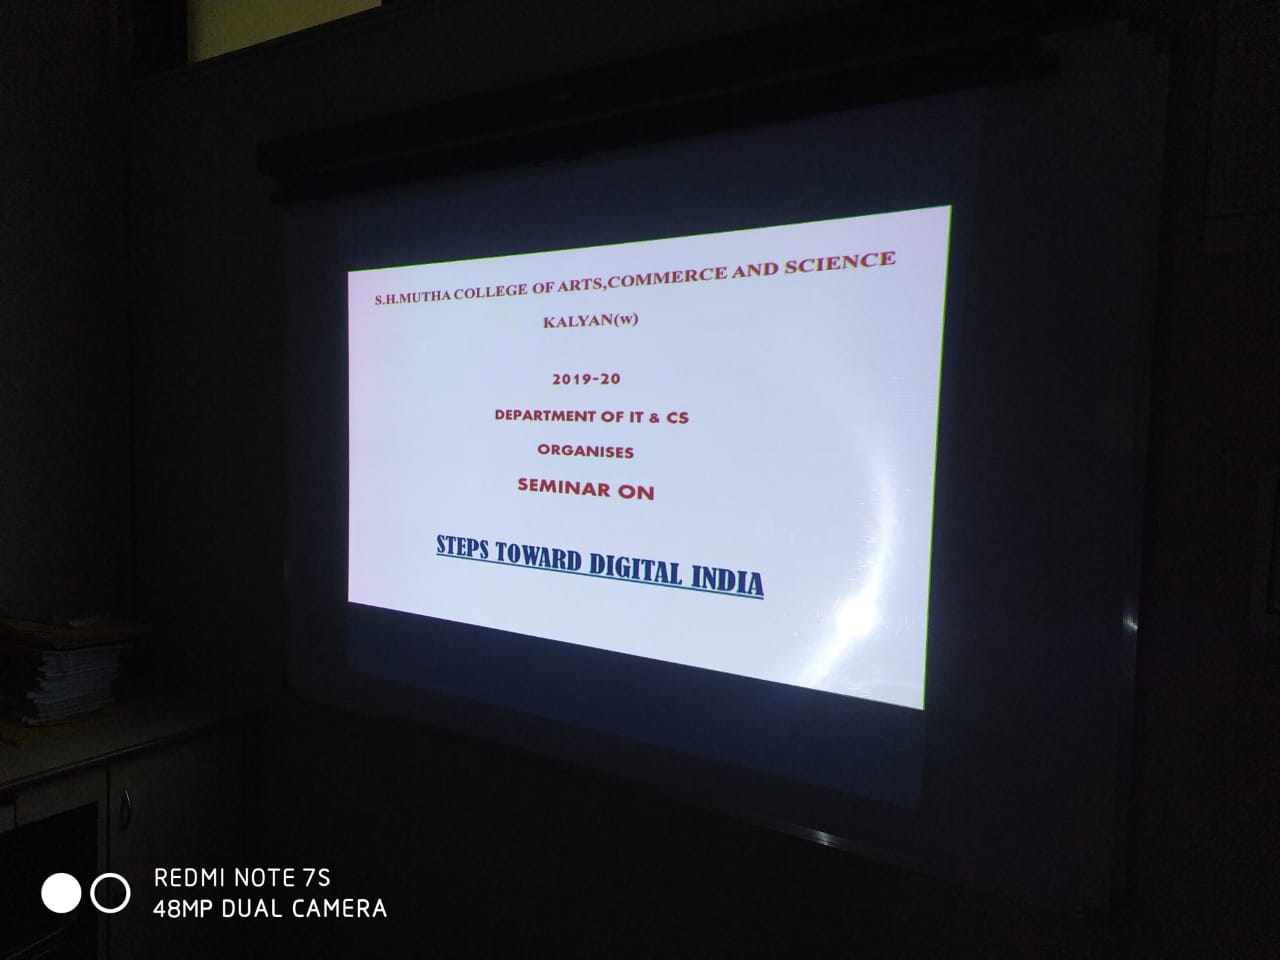 Workshop on Digital India